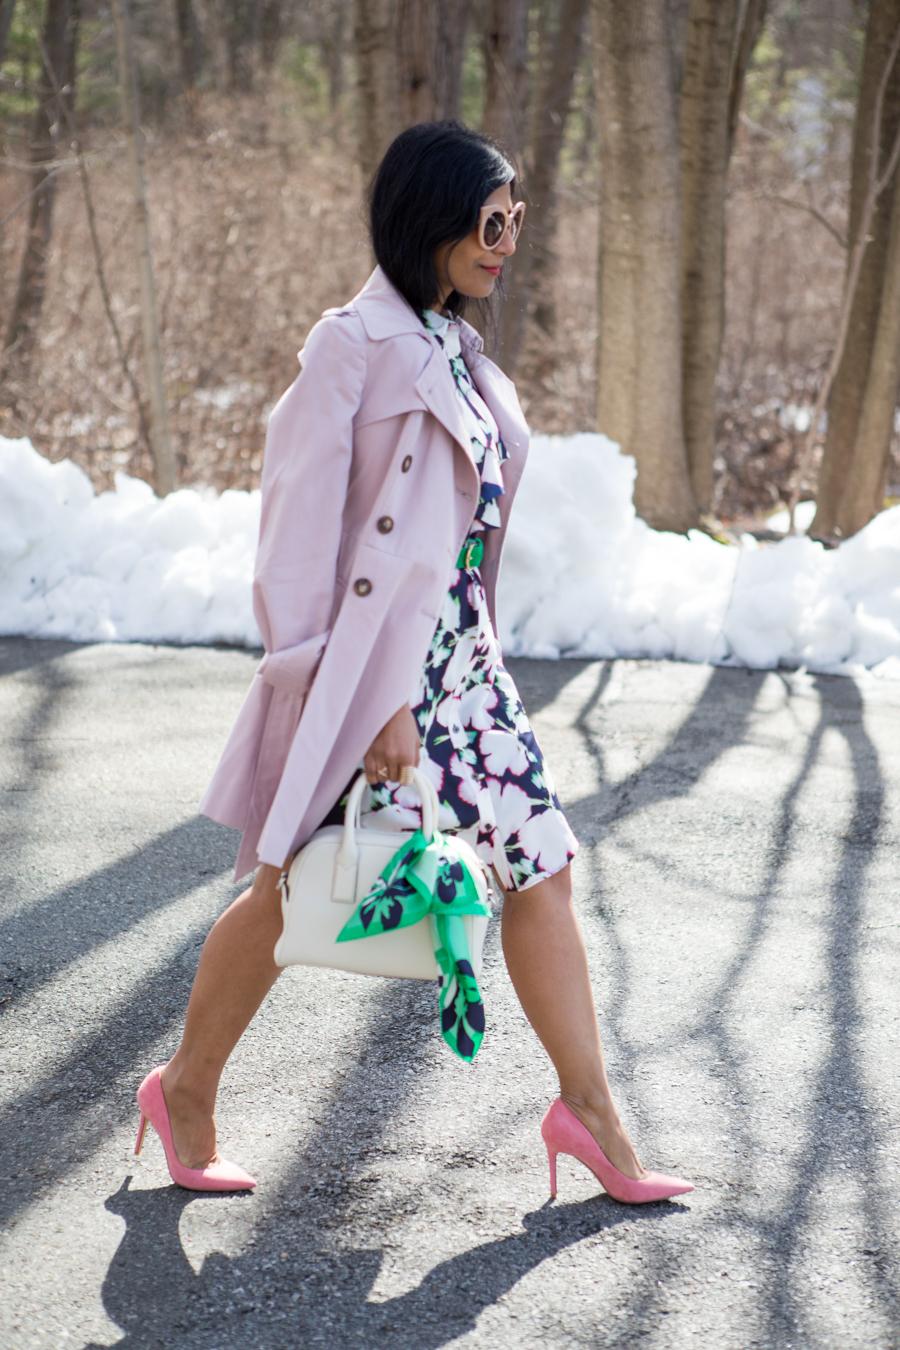 work style, spring style, floral, shirt-dress, feminine, pink, kelly green, classic feminine, fashion, petite style, office style, 9 to 5 style, petite fashion, fashion over 40, banana republic, sam edelman